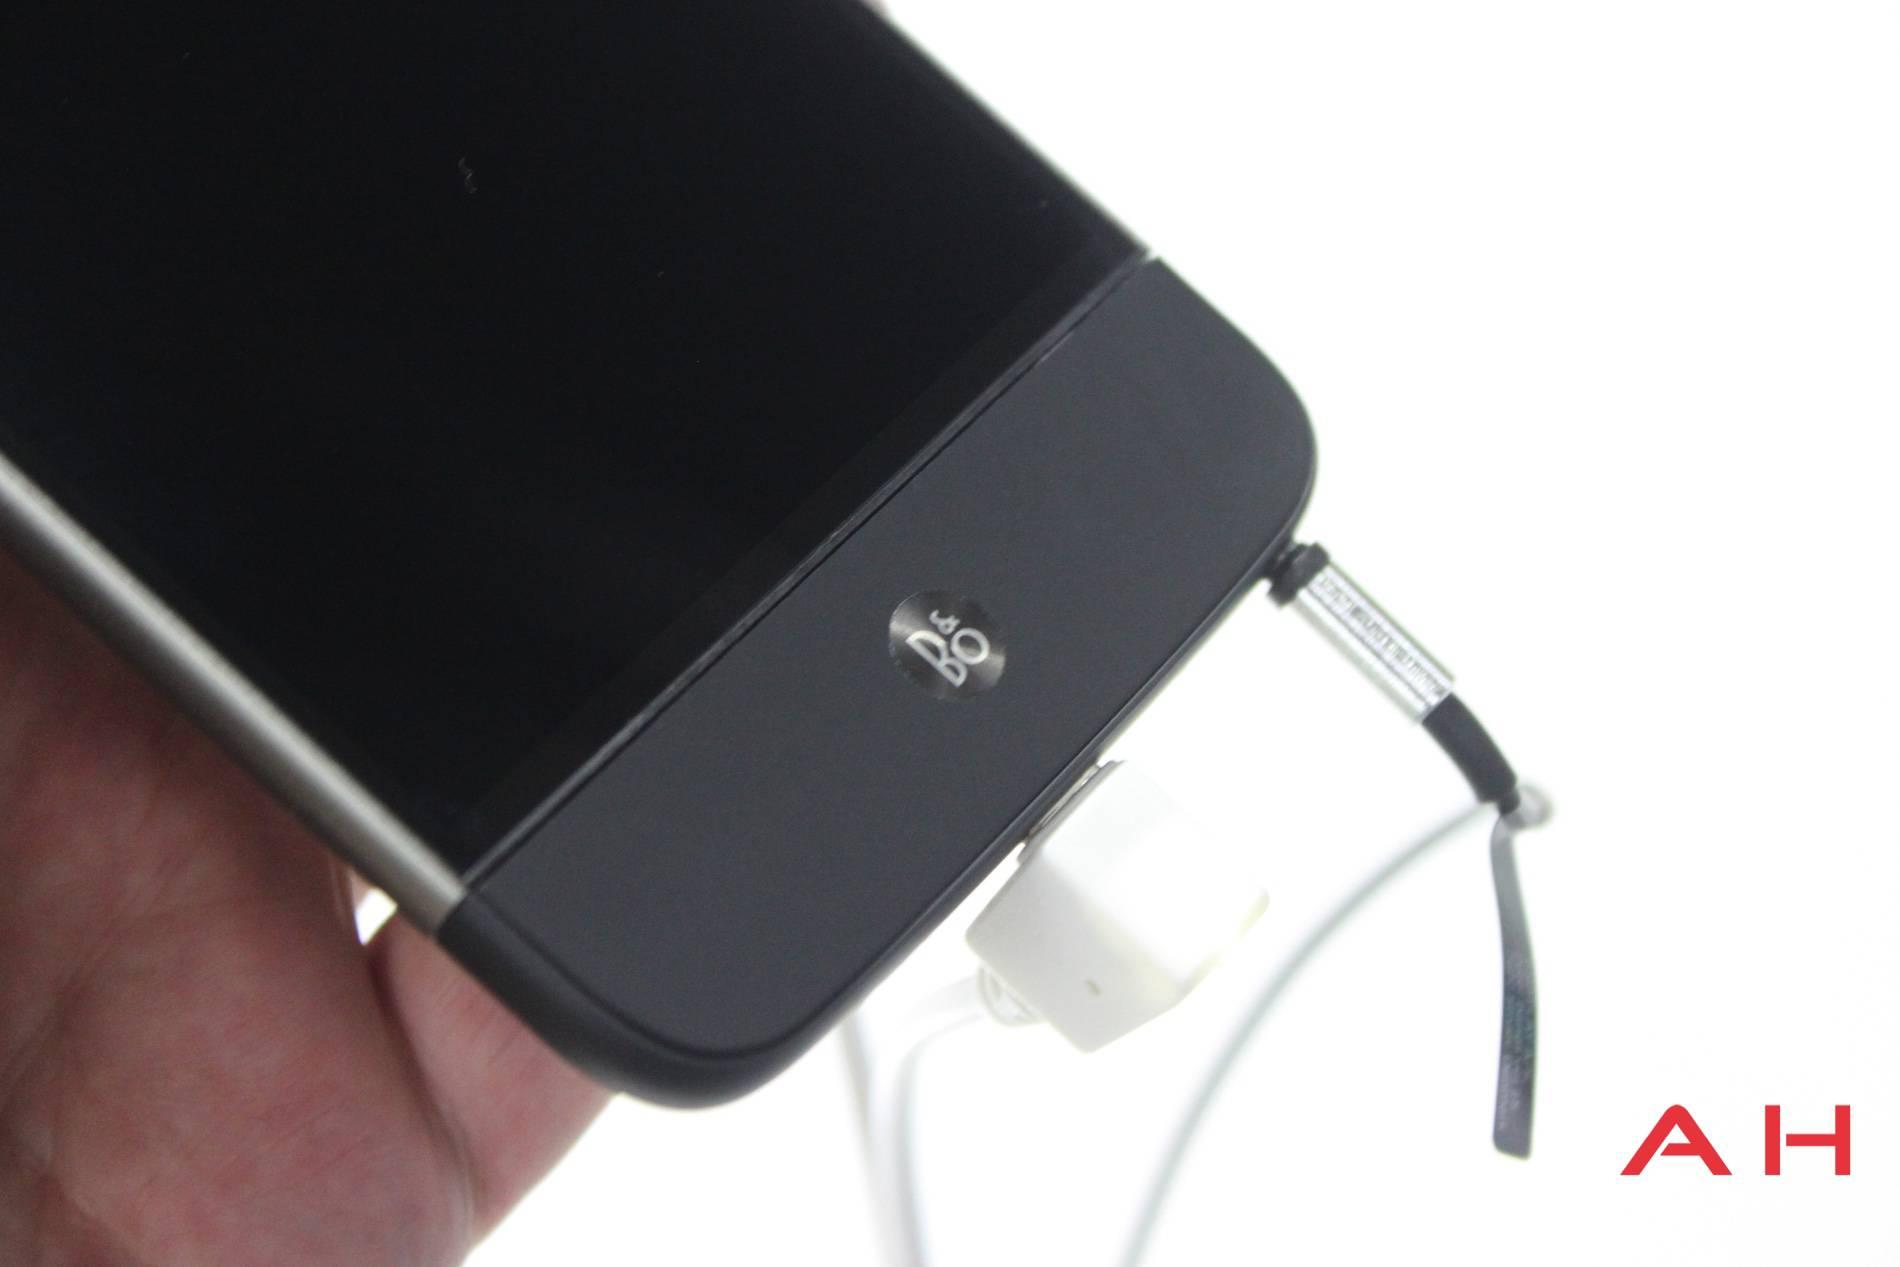 LG G5 B&O HiFi Plus AH 04